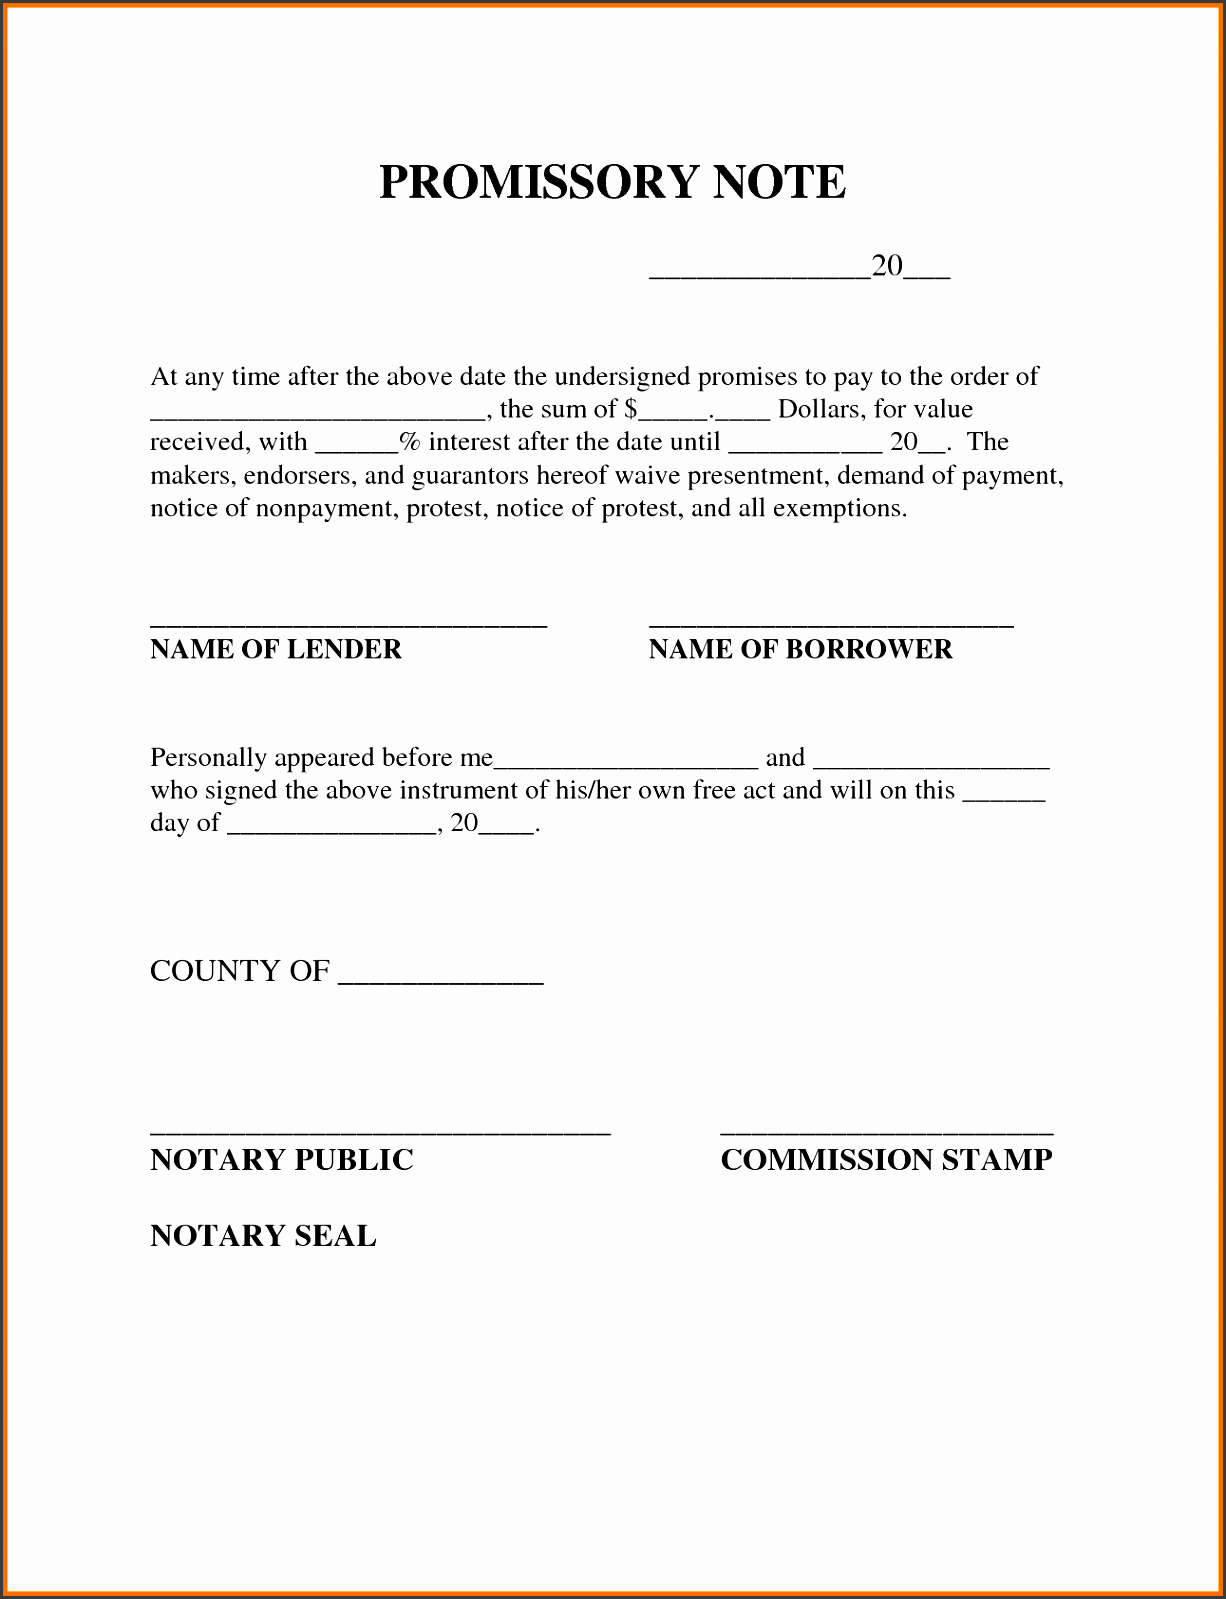 sample promissory note for cash advance officialsite